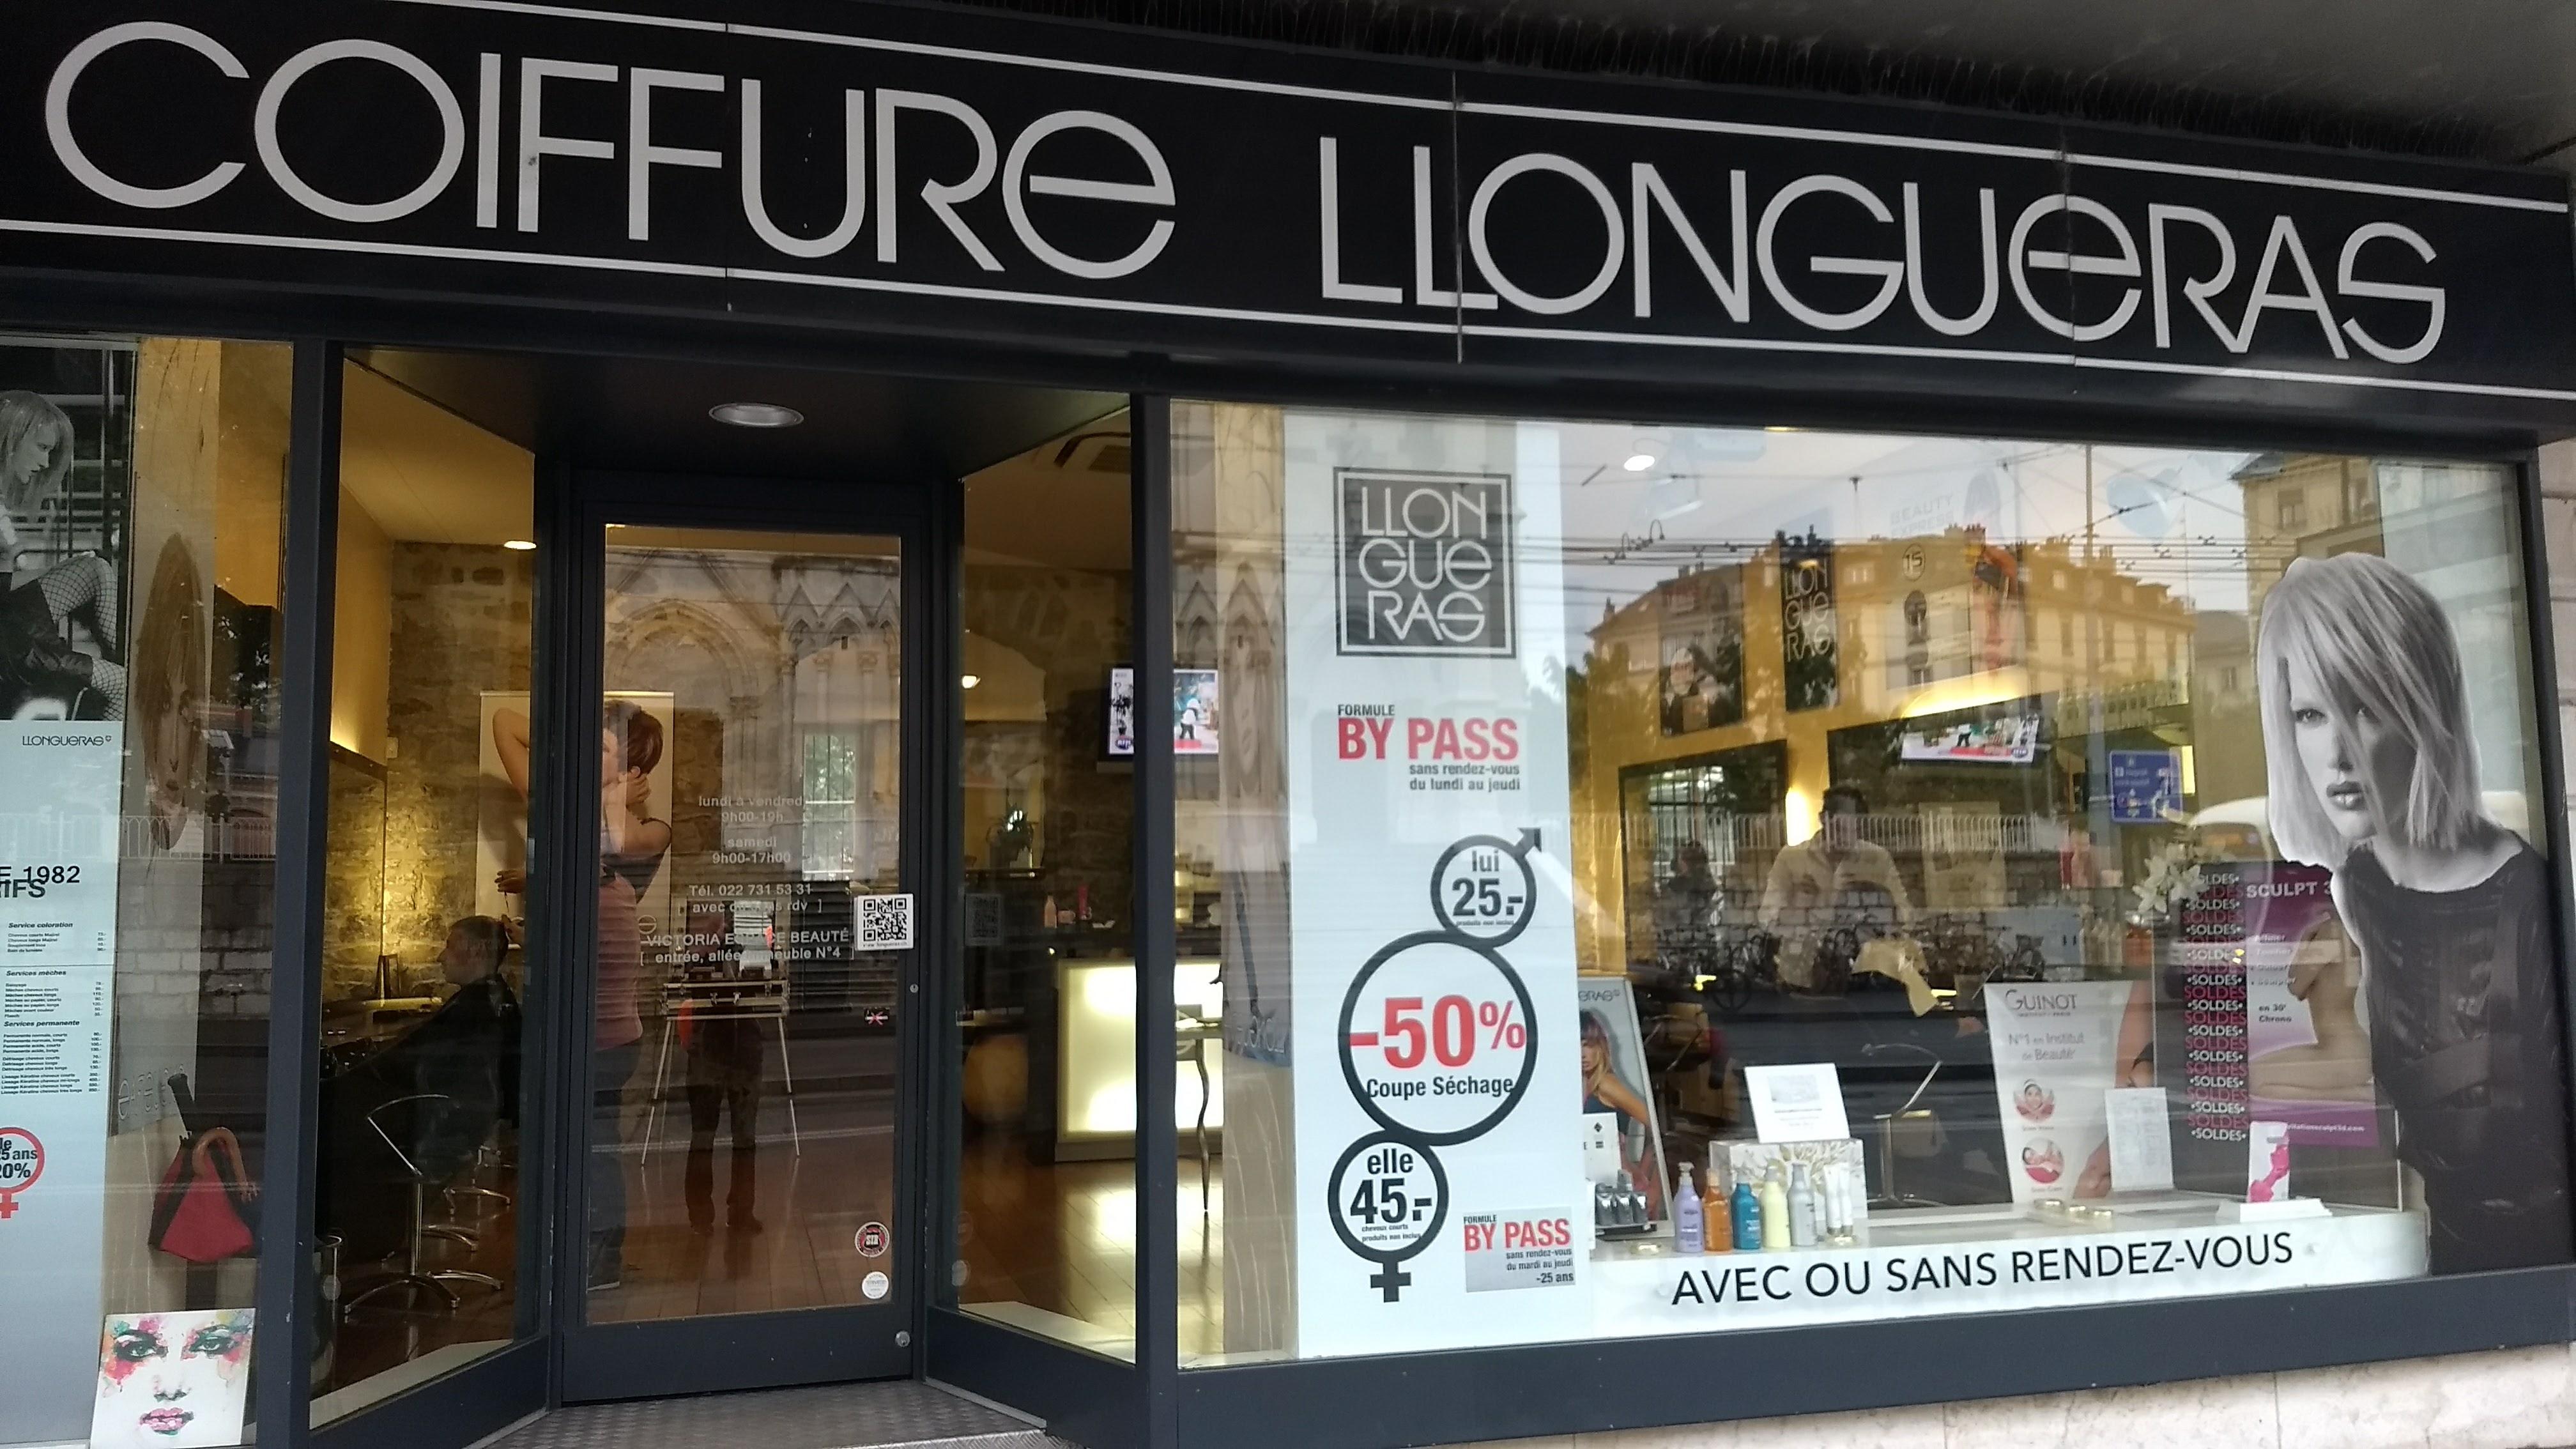 Salon de Coiffure Llongueras - Friseur | Genf | MyCityHighlight